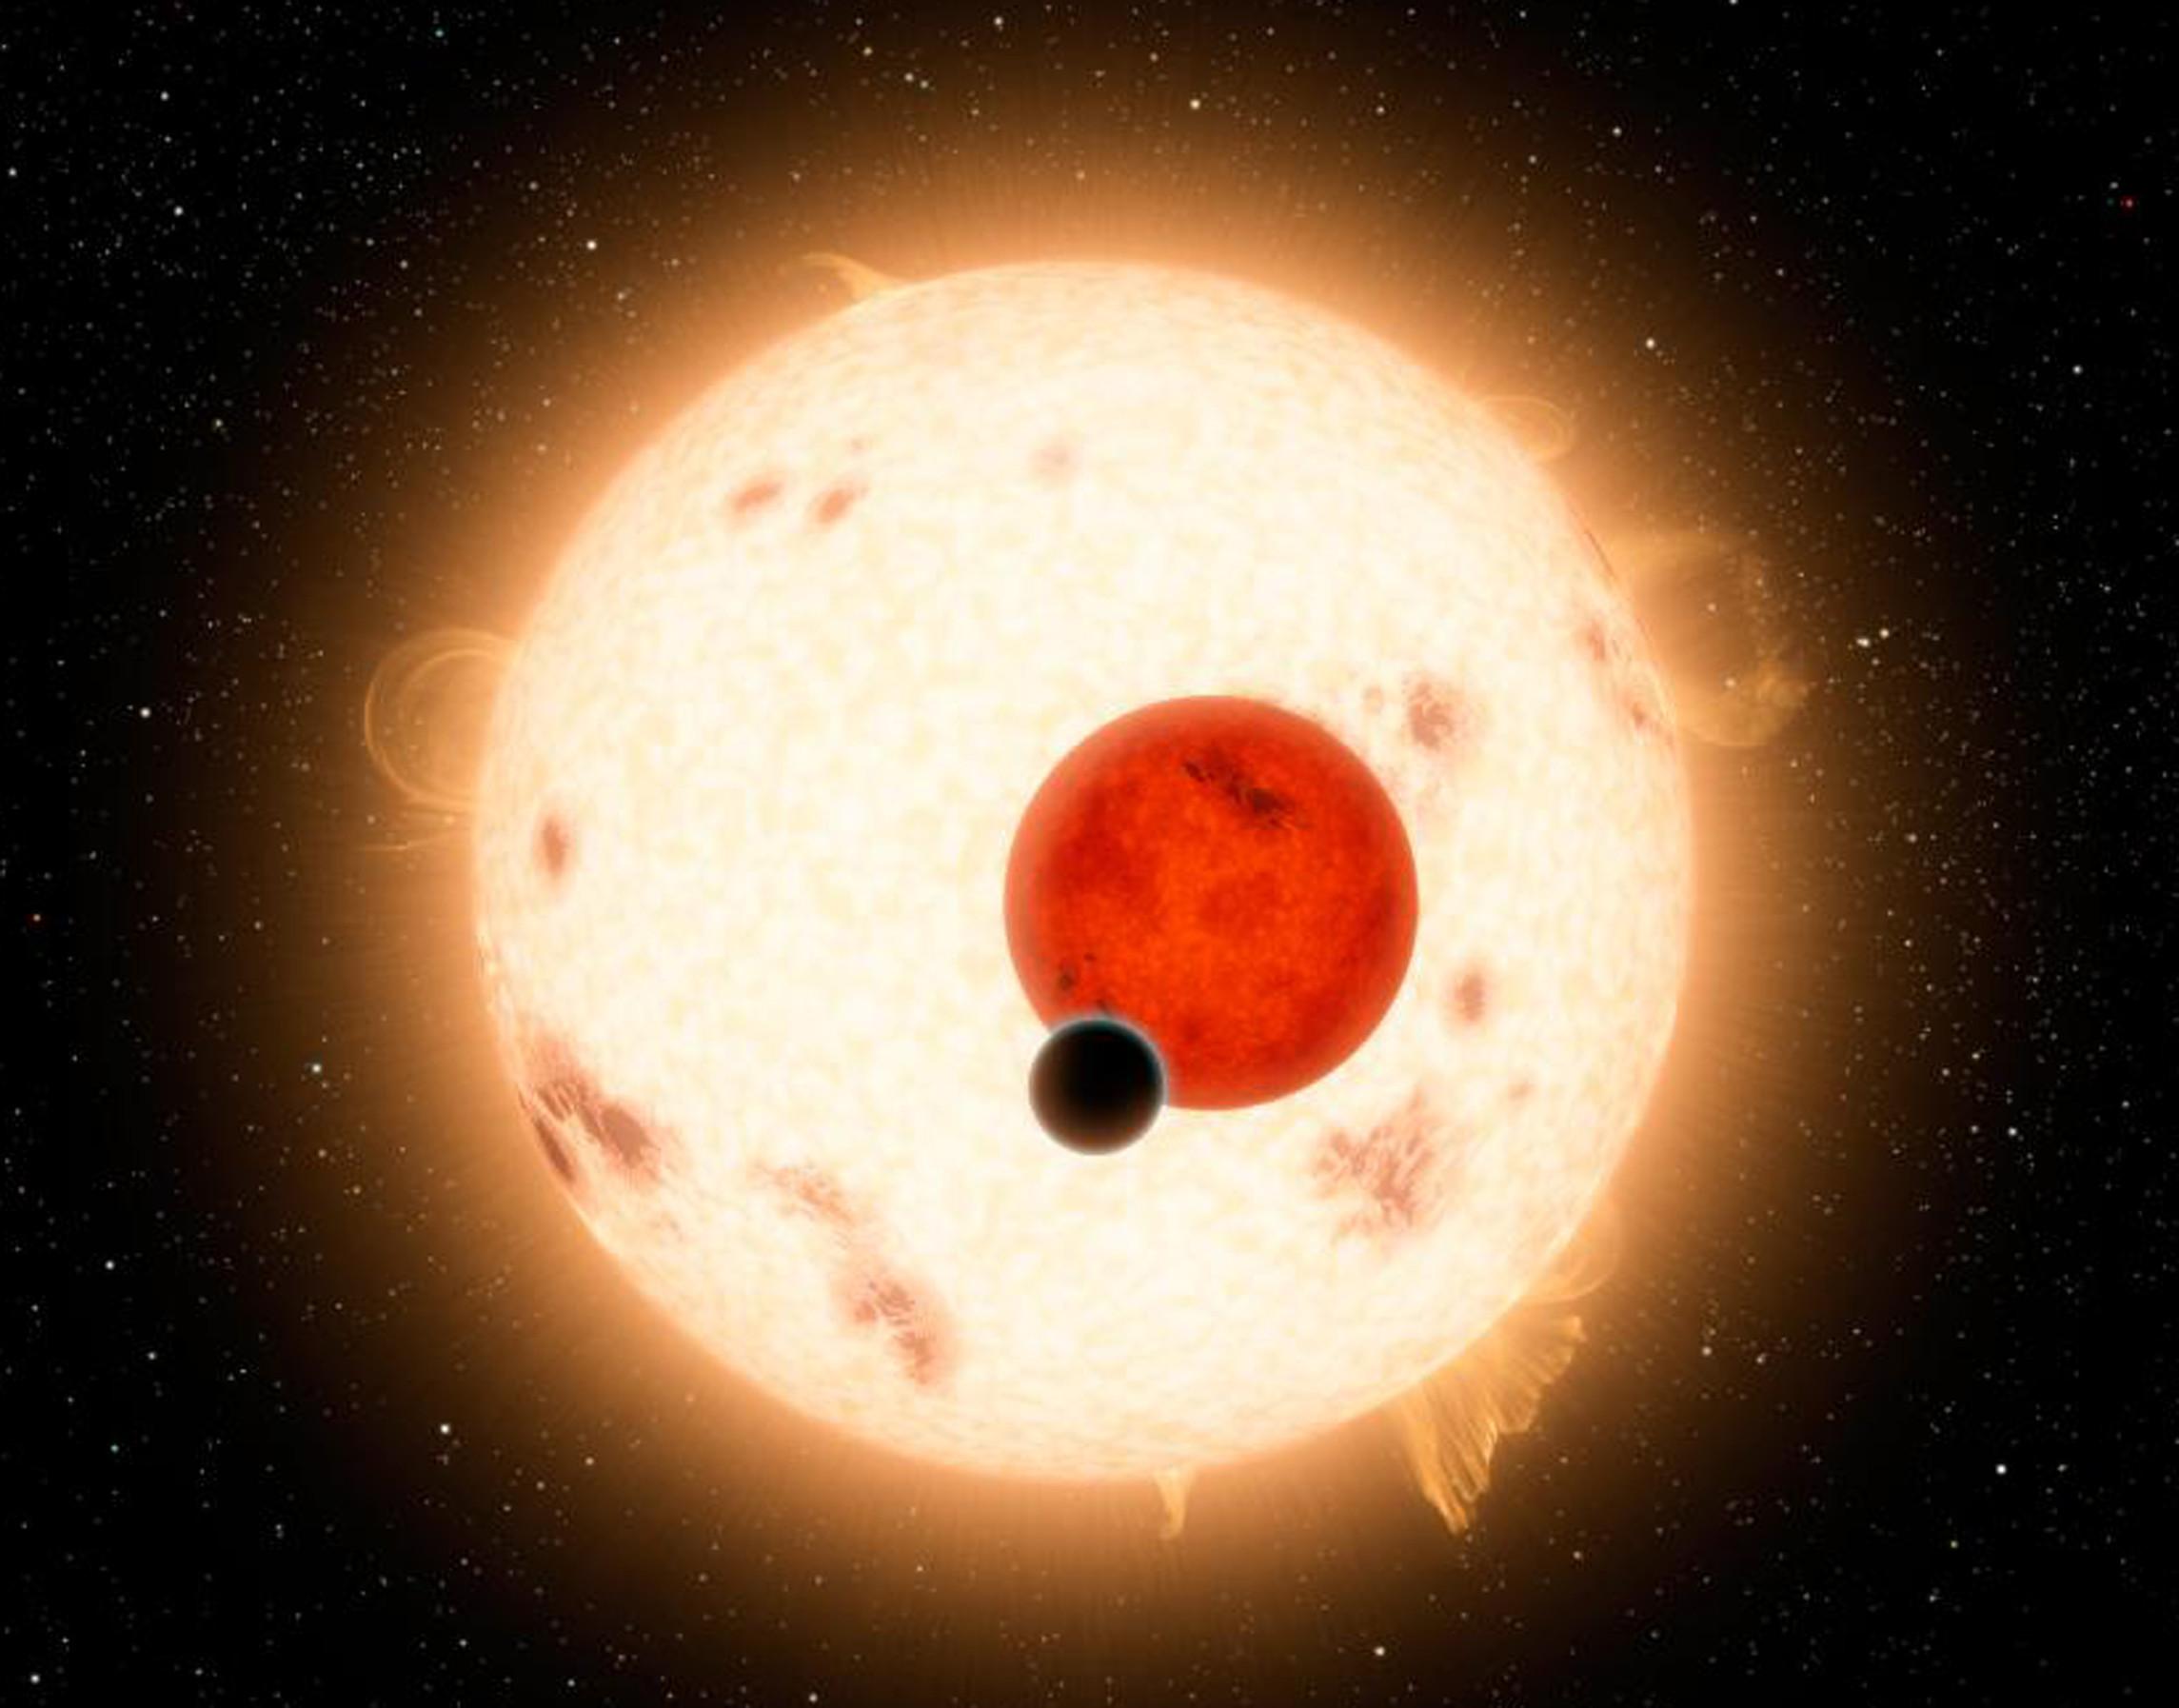 2013-05-22-starwarsplanet.jpg